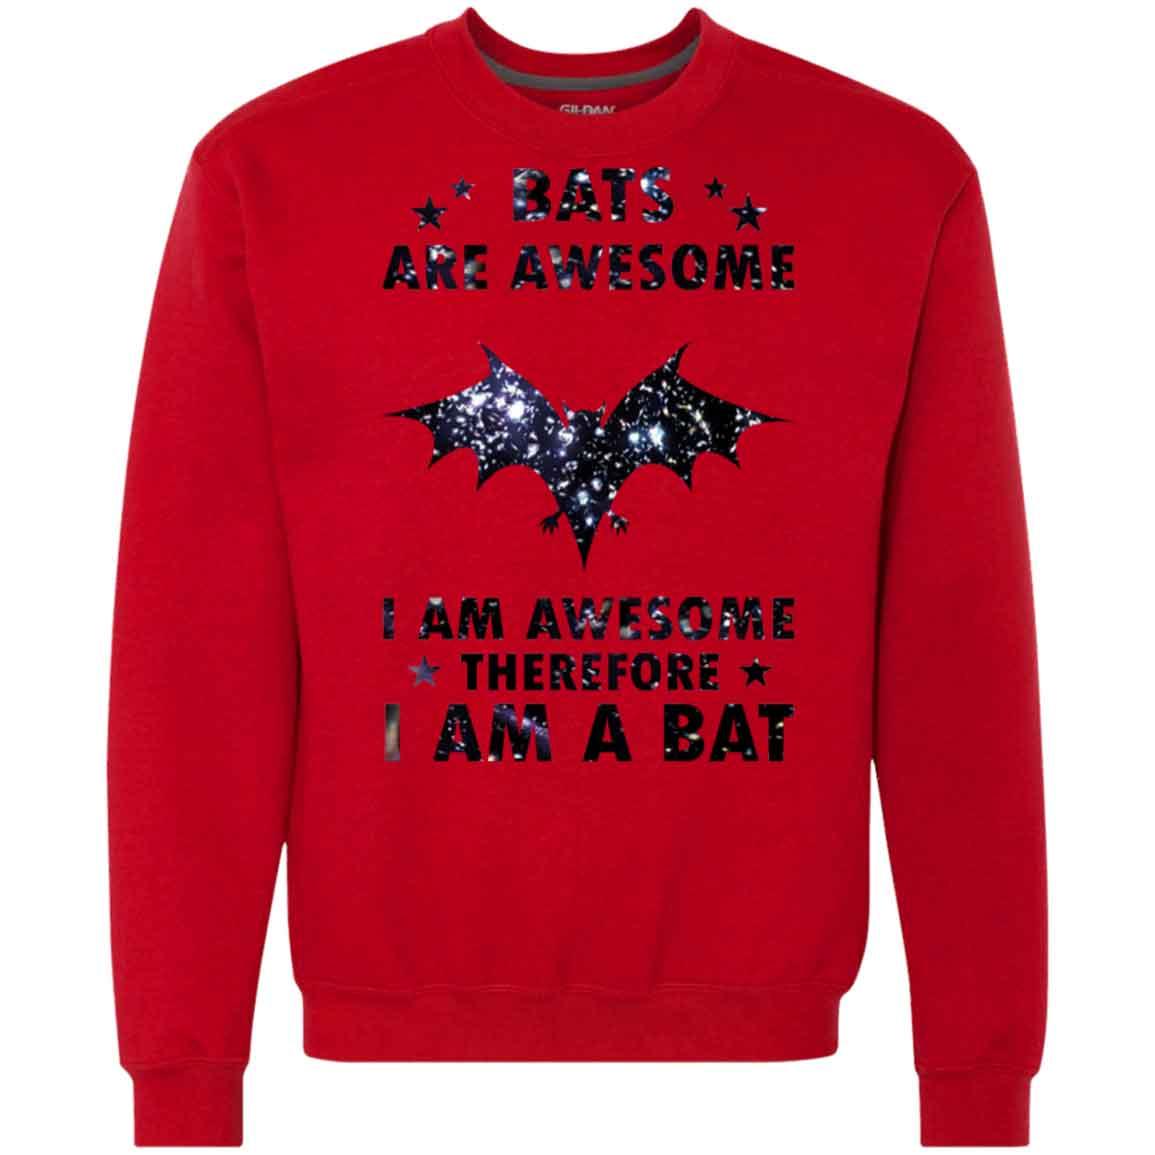 7f7015842 Bat Bats Are Awesome Hoodies Sweatshirts – TeeTrio